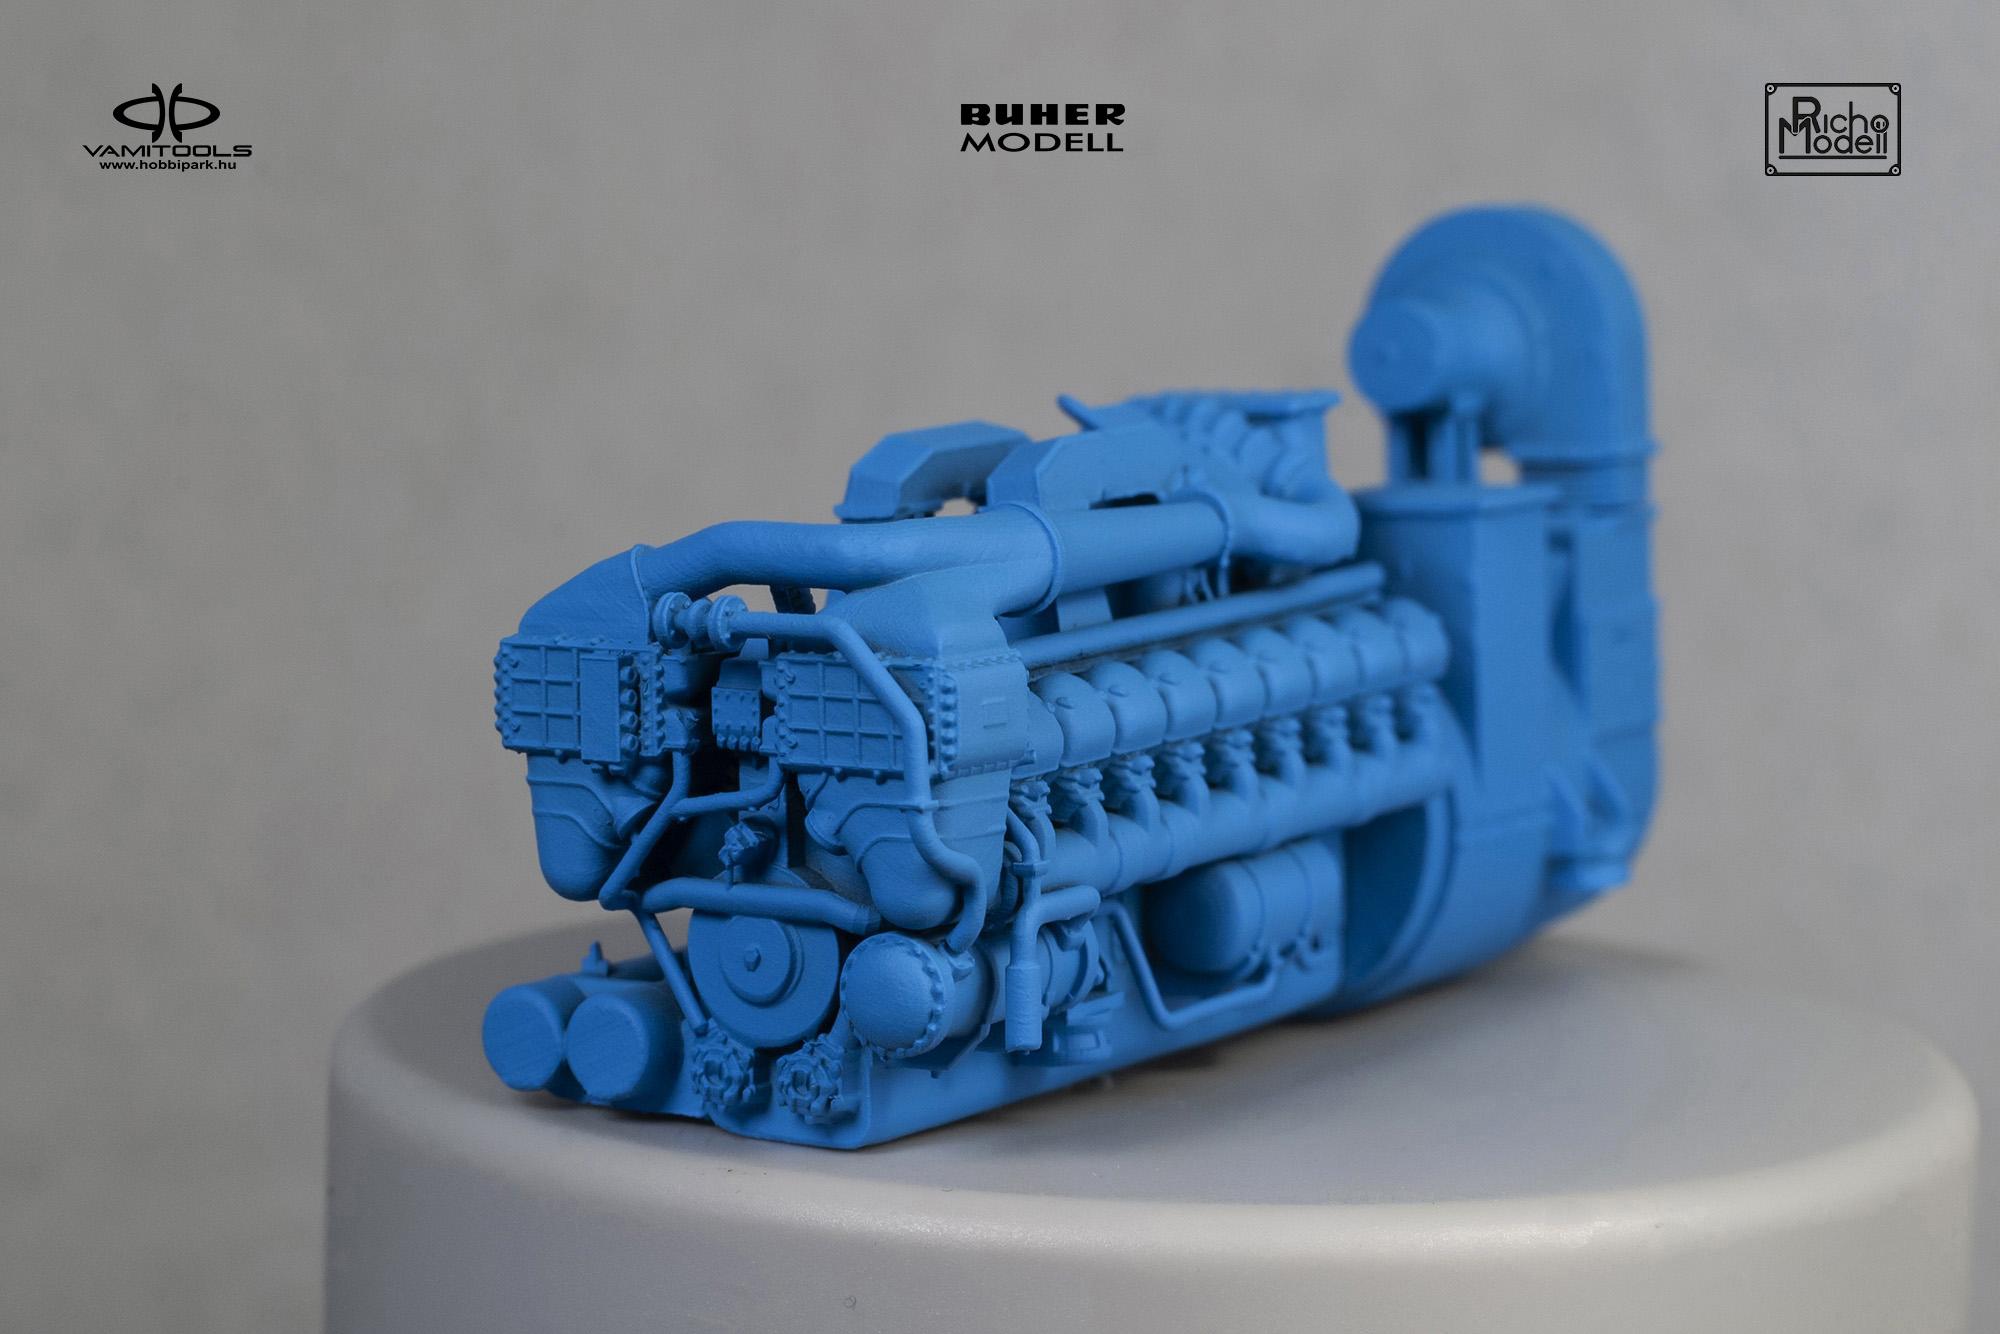 motor, M63 motor, gyík motor, mozdony motor, M63 mozdony motor, MÁV motor, MÁV M63 motor, MÁV gyík motor, MÁV mozdony motor, MÁV M63 mozdony motor, H0 motor, H0 M63 motor, H0 gyík motor, H0 mozdony motor, H0 M63 mozdony motor, H0 MÁV motor, H0 MÁV M63 motor, H0 MÁV gyík motor, H0 MÁV mozdony motor, H0 MÁV M63 mozdony motor, 1:87 motor, 1:87 M63 motor, 1:87 gyík motor, 1:87 mozdony motor, 1:87 M63 mozdony motor, 1:87 MÁV motor, 1:87 MÁV M63 motor, 1:87 MÁV gyík motor, 1:87 MÁV mozdony motor, 1:87 MÁV M63 mozdony motor, modell motor, modell M63 motor, modell gyík motor, modell mozdony motor, modell M63 mozdony motor, modell MÁV motor, modell MÁV M63 motor, modell MÁV gyík motor, modell MÁV mozdony motor, modell MÁV M63 mozdony motor, makett motor, makett M63 motor, makett gyík motor, makett mozdony motor, makett M63 mozdony motor, makett MÁV motor, makett MÁV M63 motor, makett MÁV gyík motor, makett MÁV mozdony motor, makett MÁV M63 mozdony motor